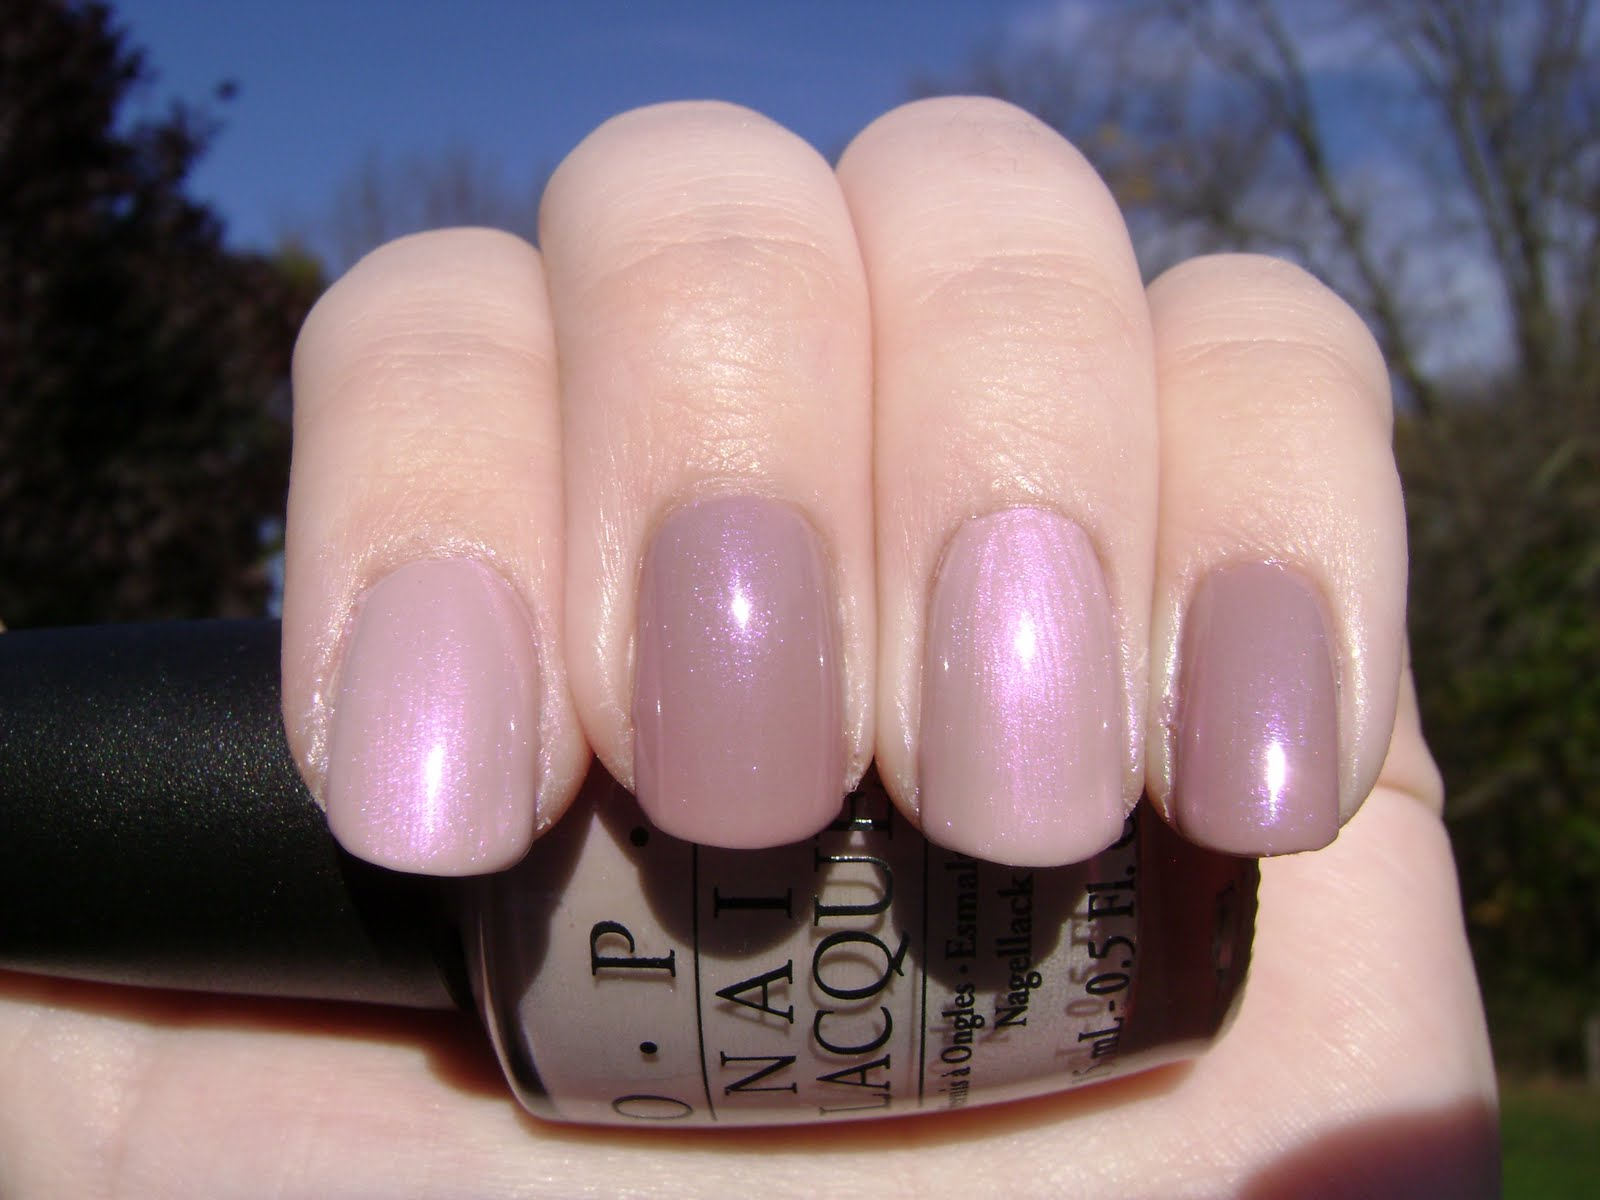 Jeweled Tips: Demure Vixen vs. Venus di Violet (comparison)